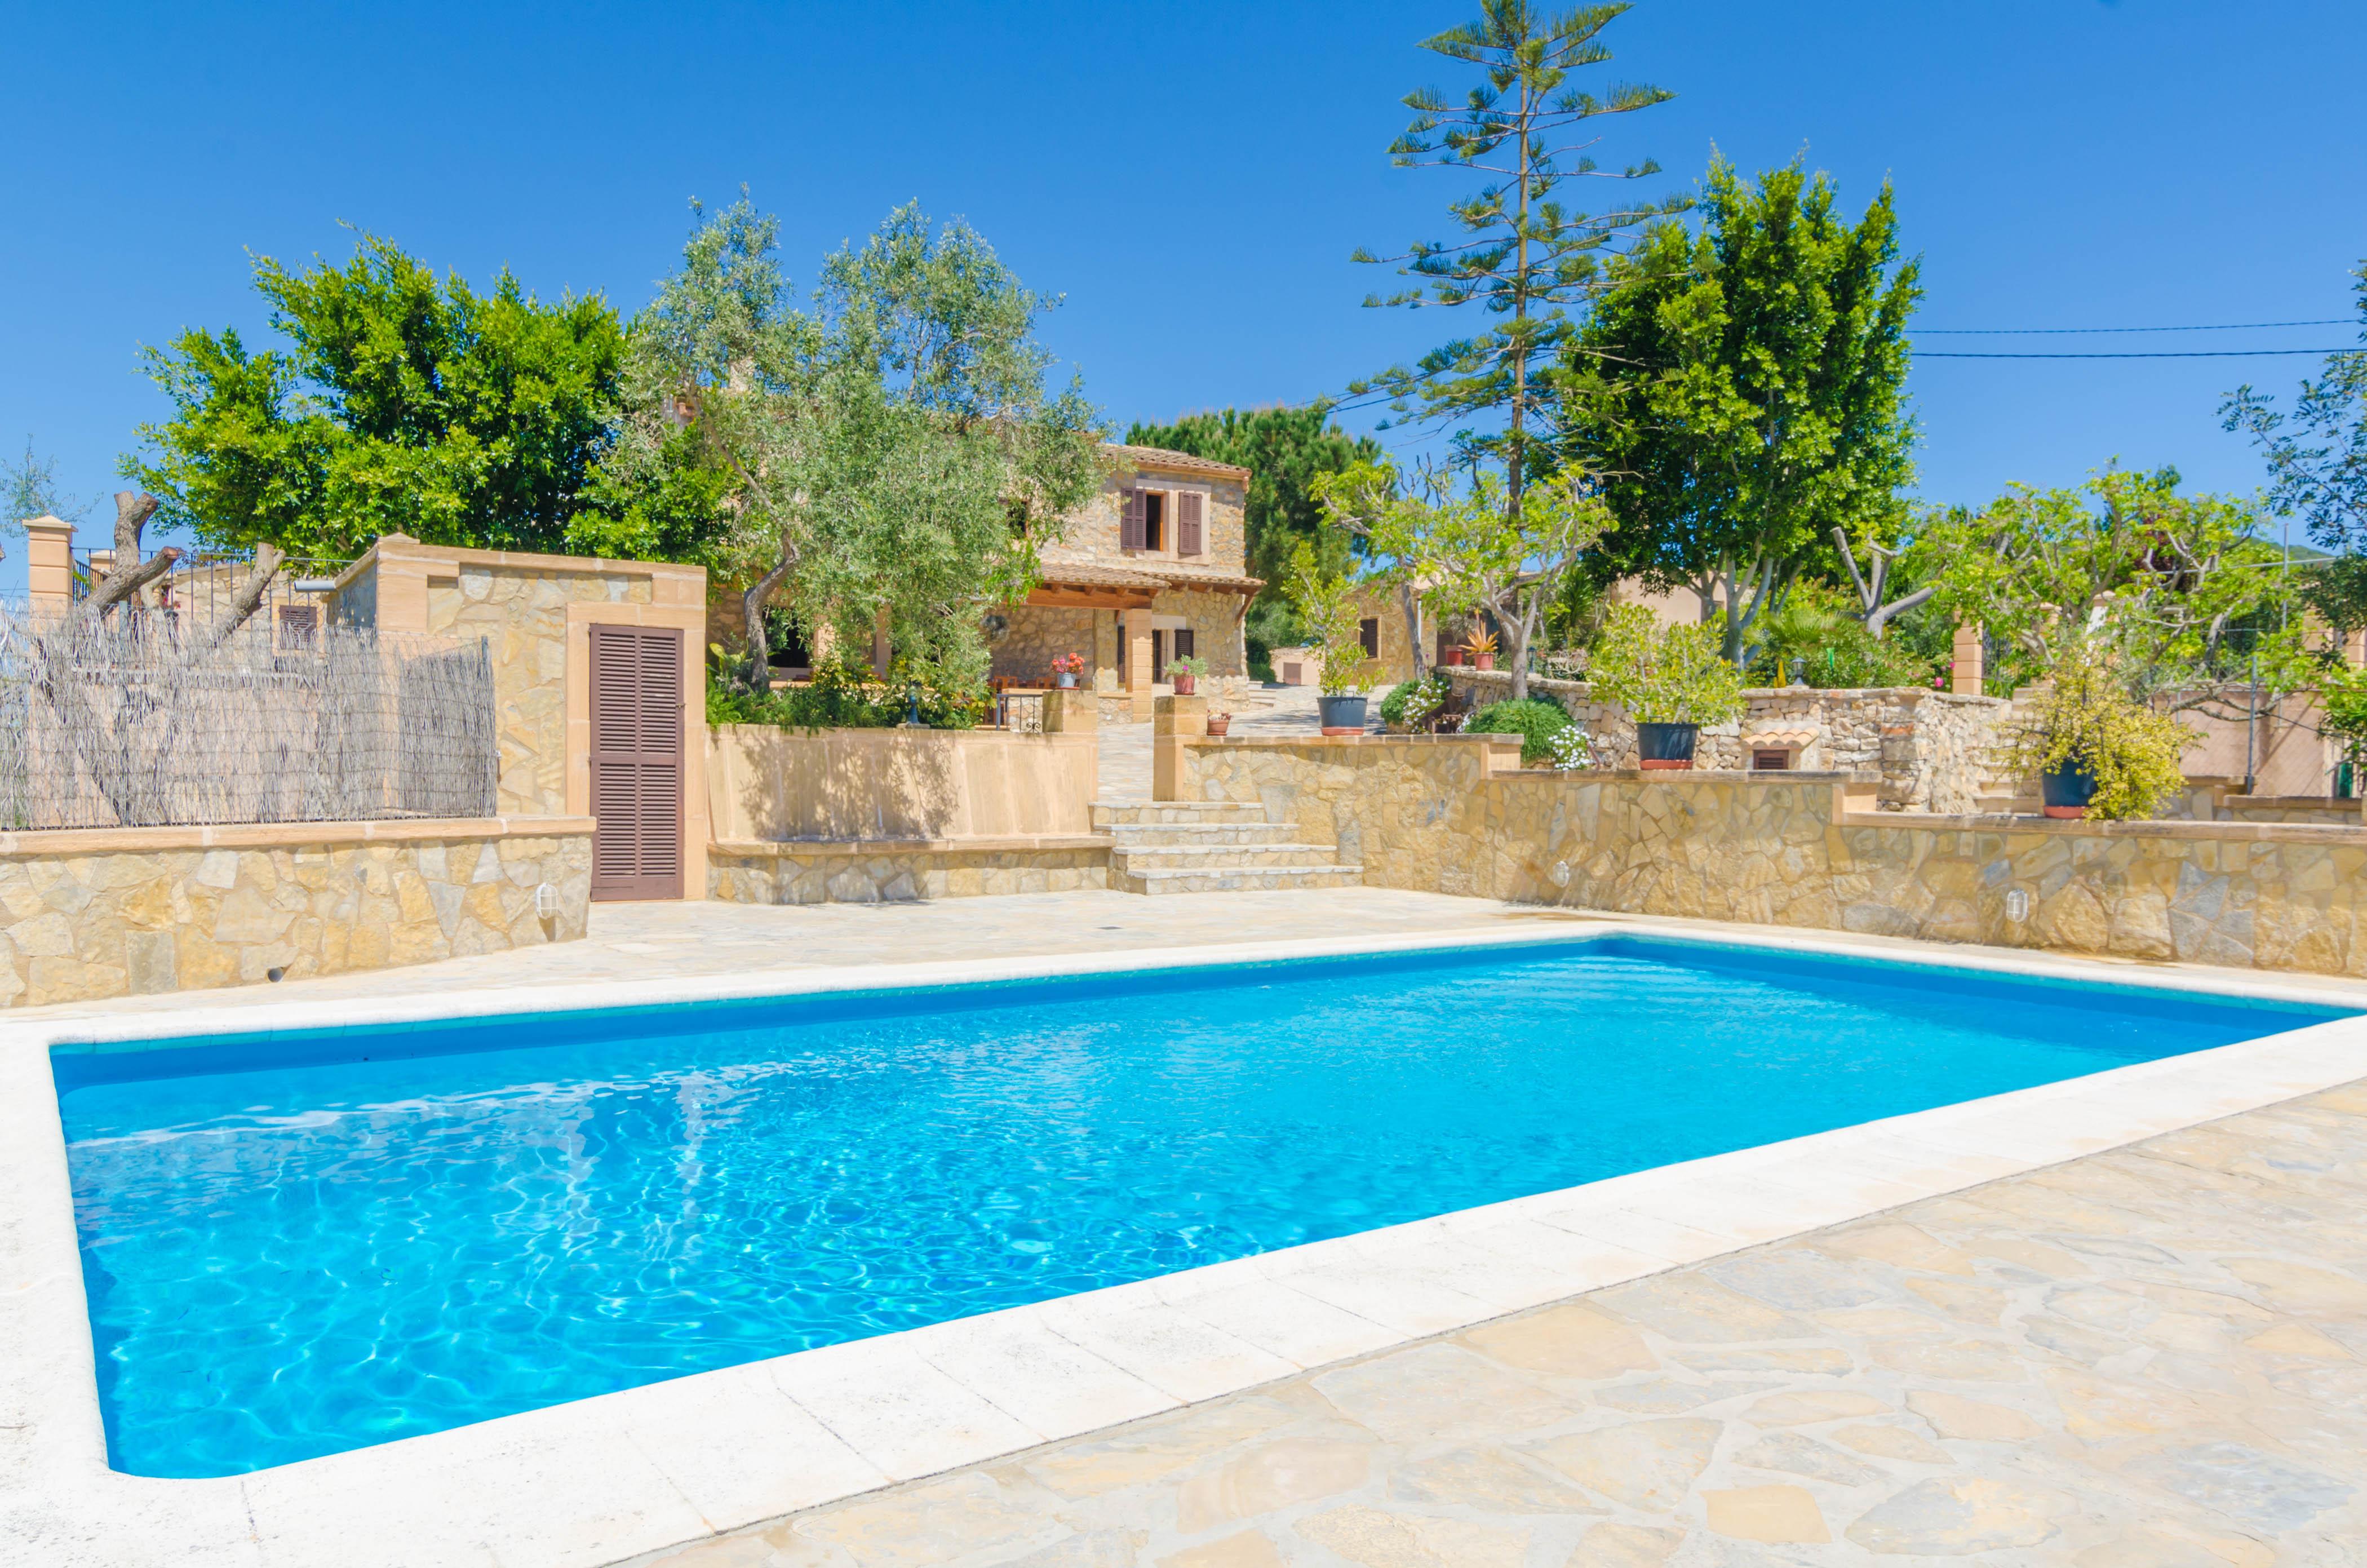 Ferienhaus SON MACIA (2186582), Son Macià, Mallorca, Balearische Inseln, Spanien, Bild 2